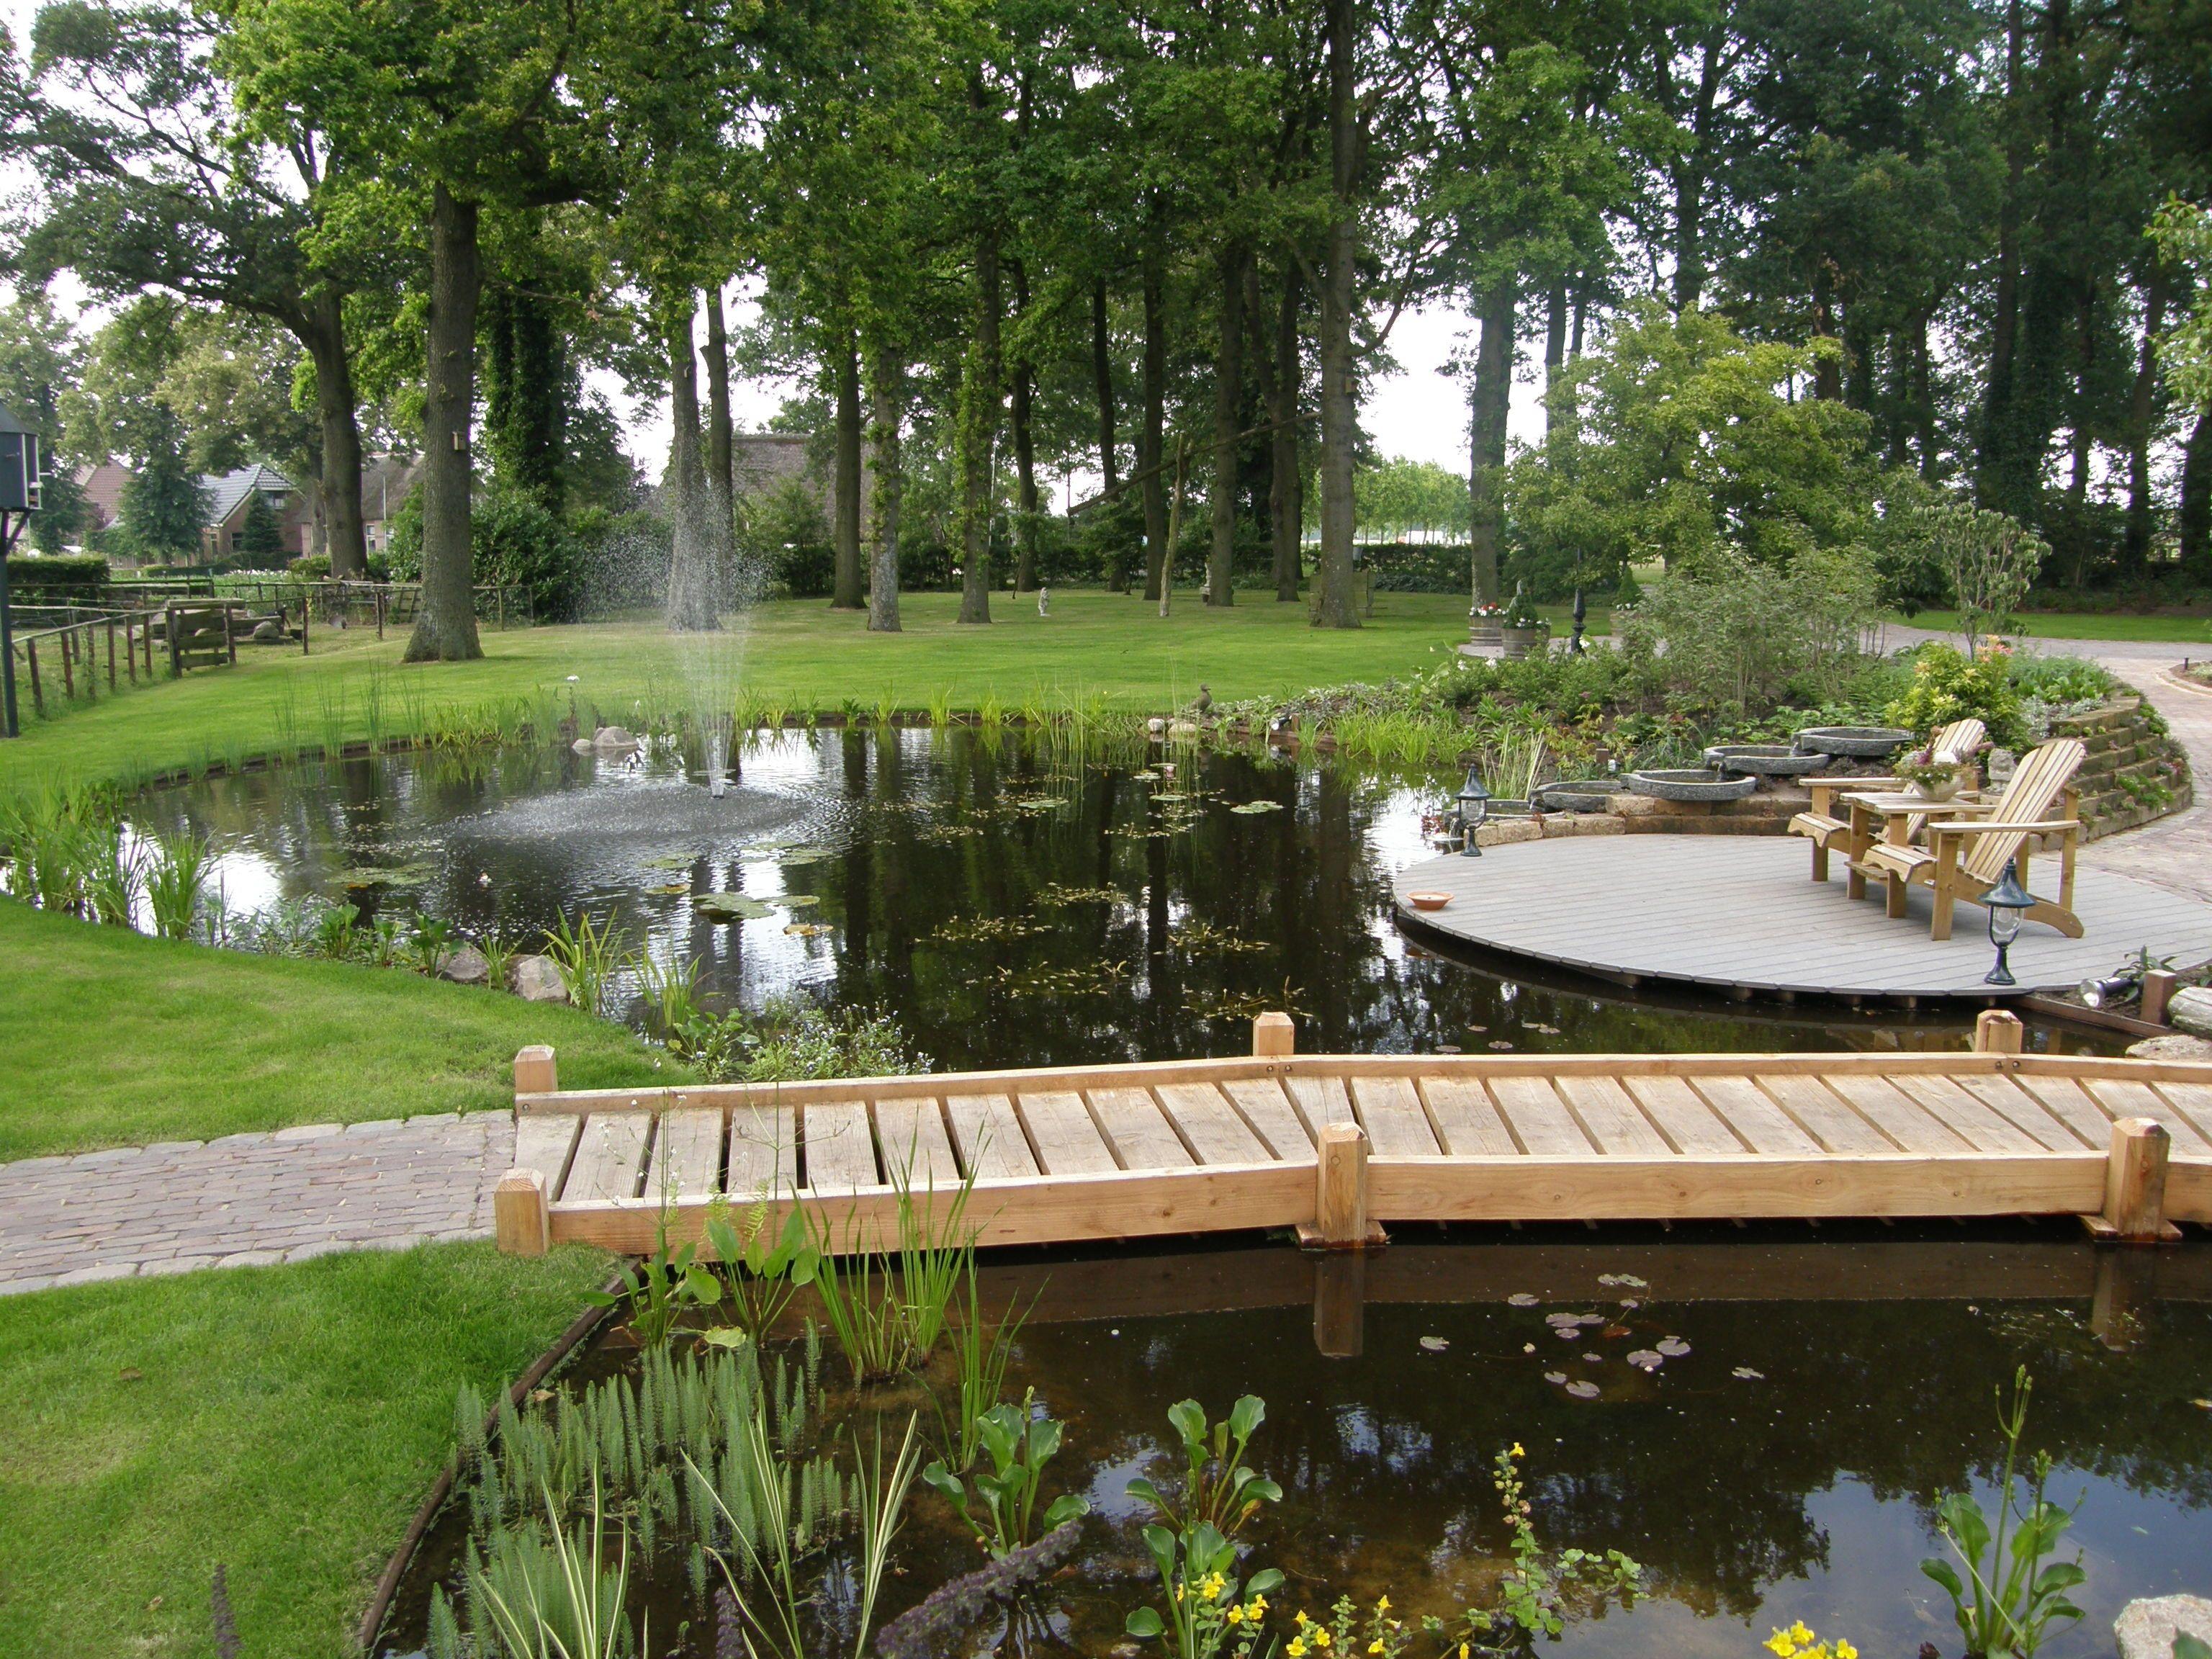 Landelijke vijver 3s tuinen olst tuinontwerp for Tuin en vijver